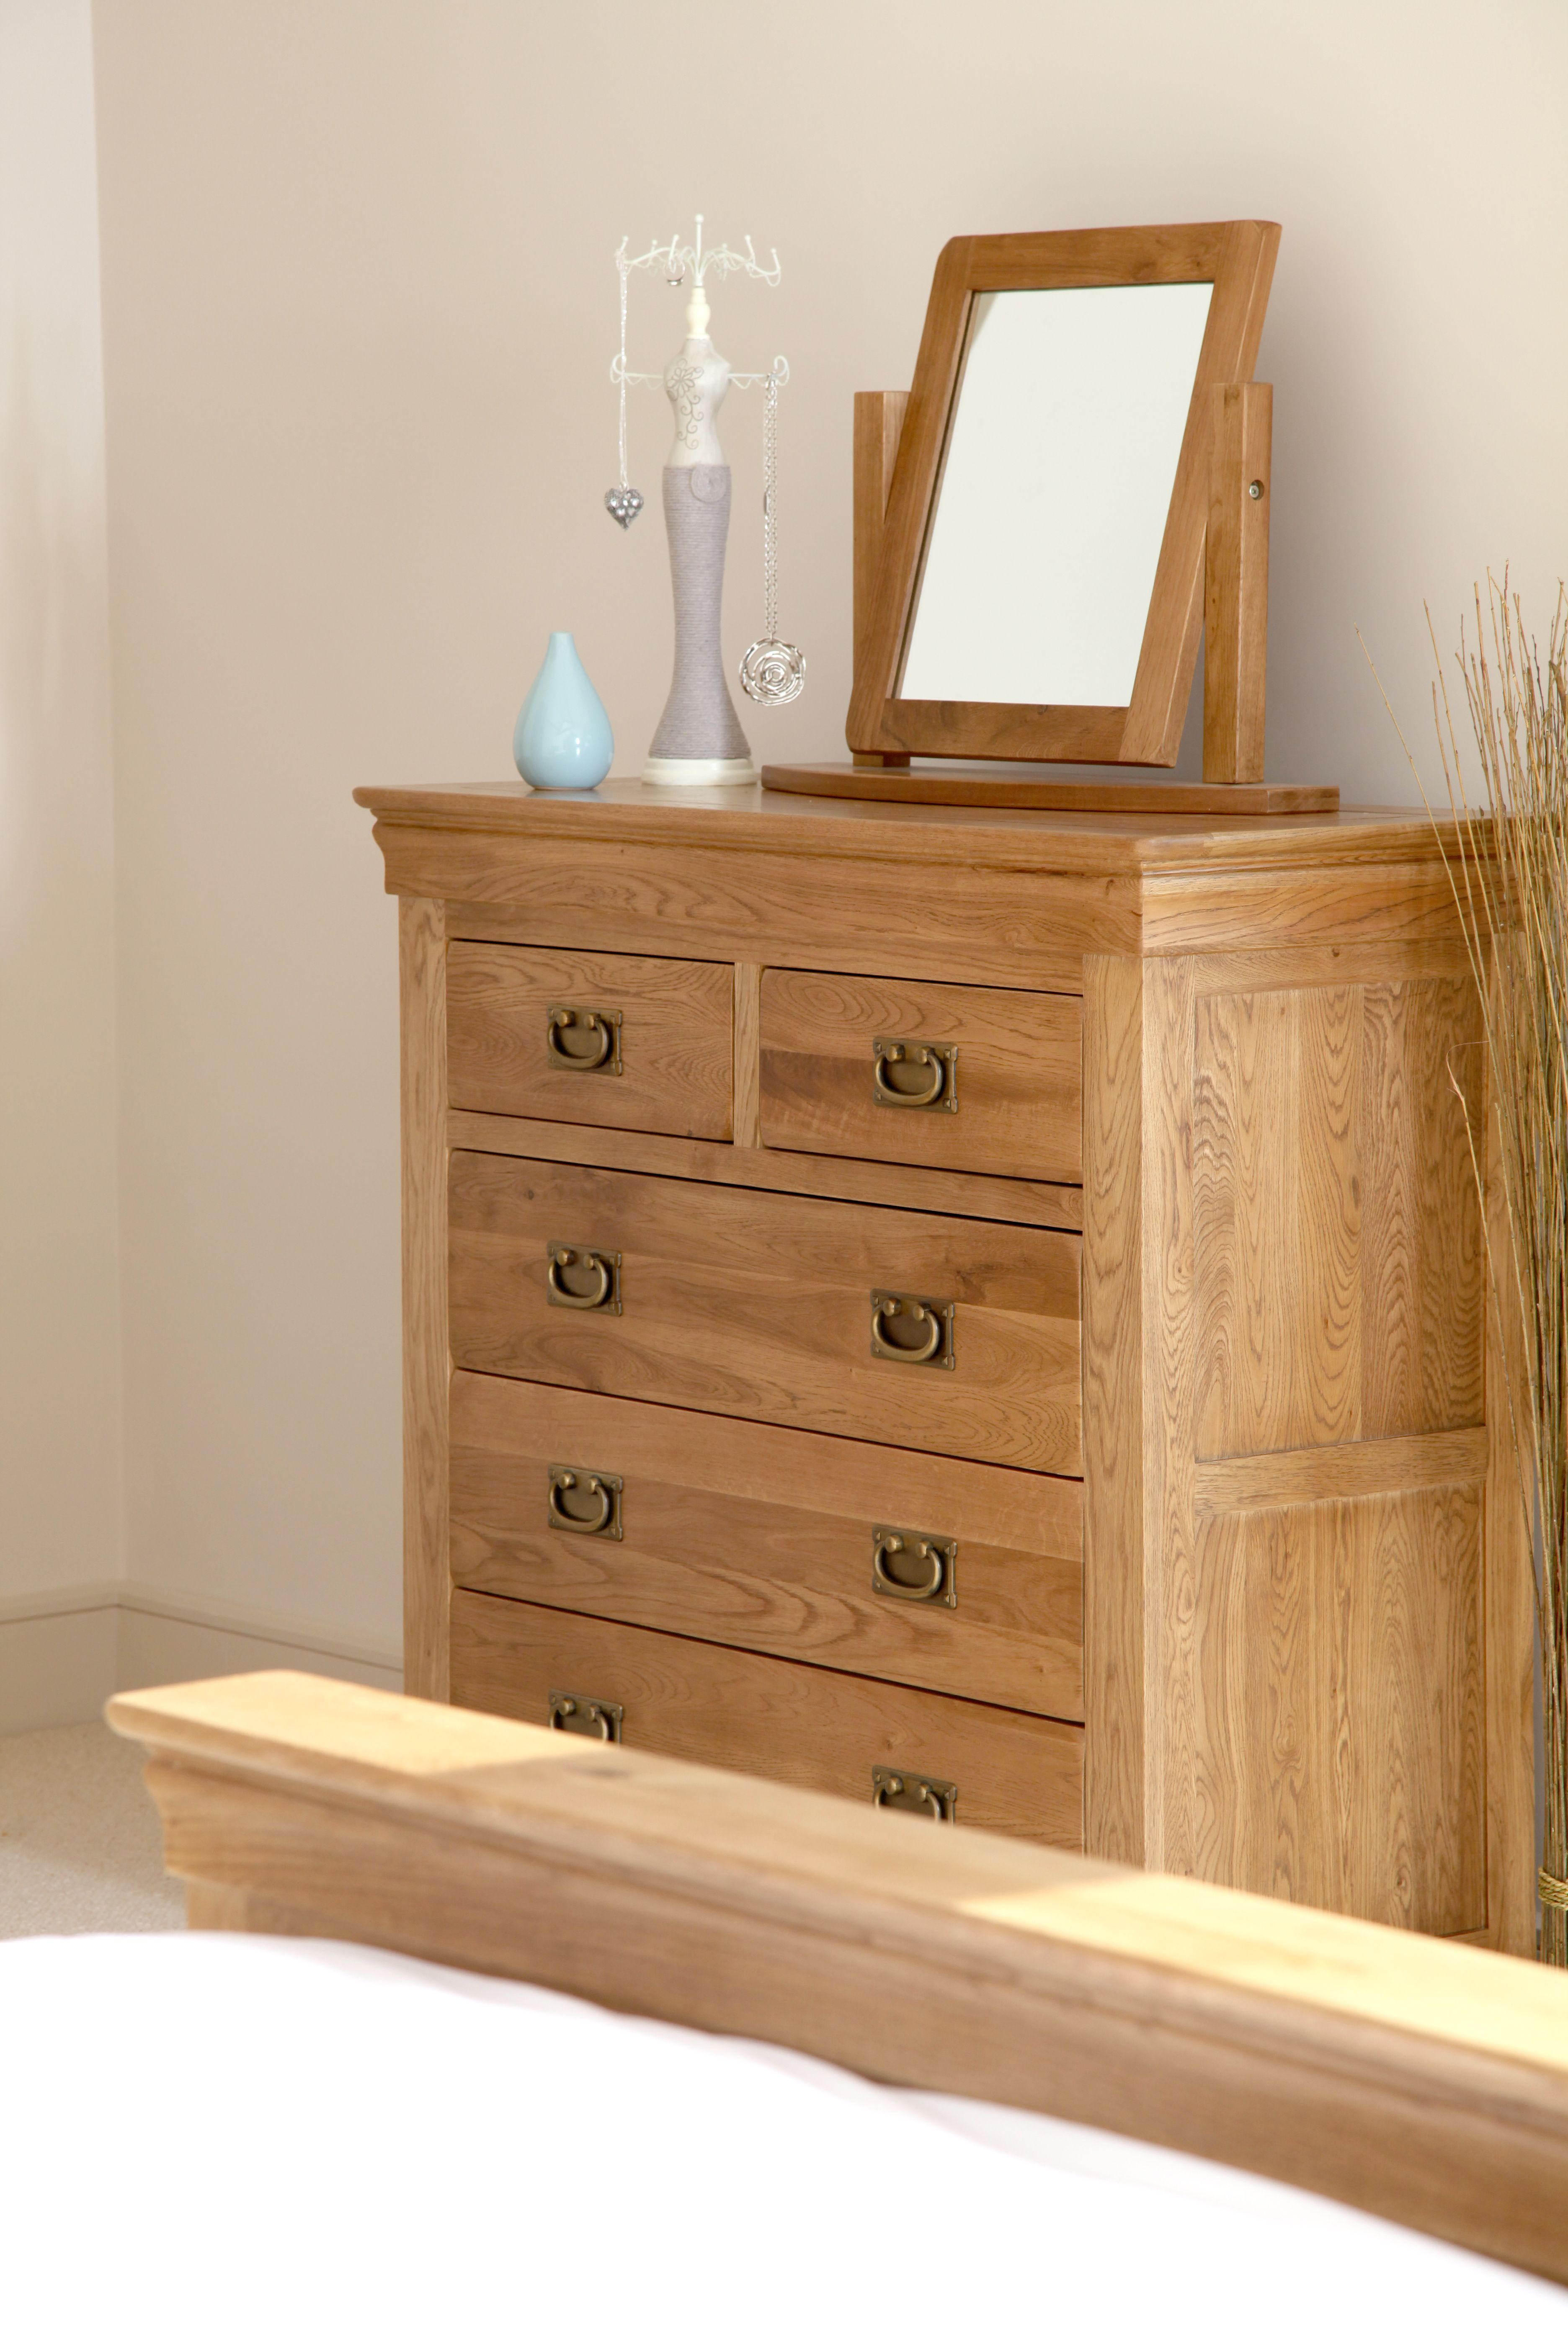 French Farmhouse Solid Oak Bedroom Furniture Oak Furniture